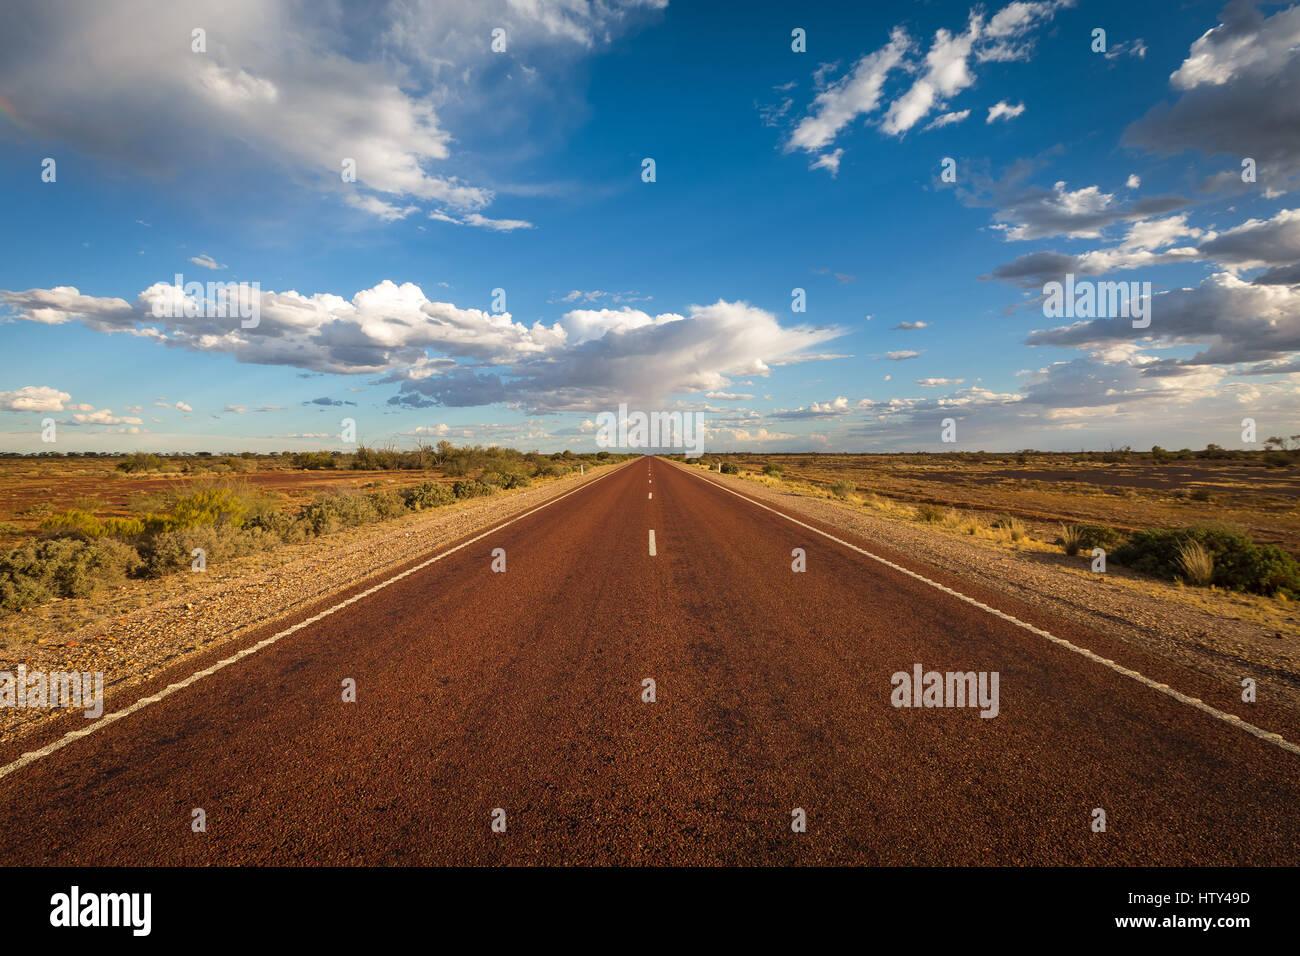 Outback Road - Australia Imagen De Stock